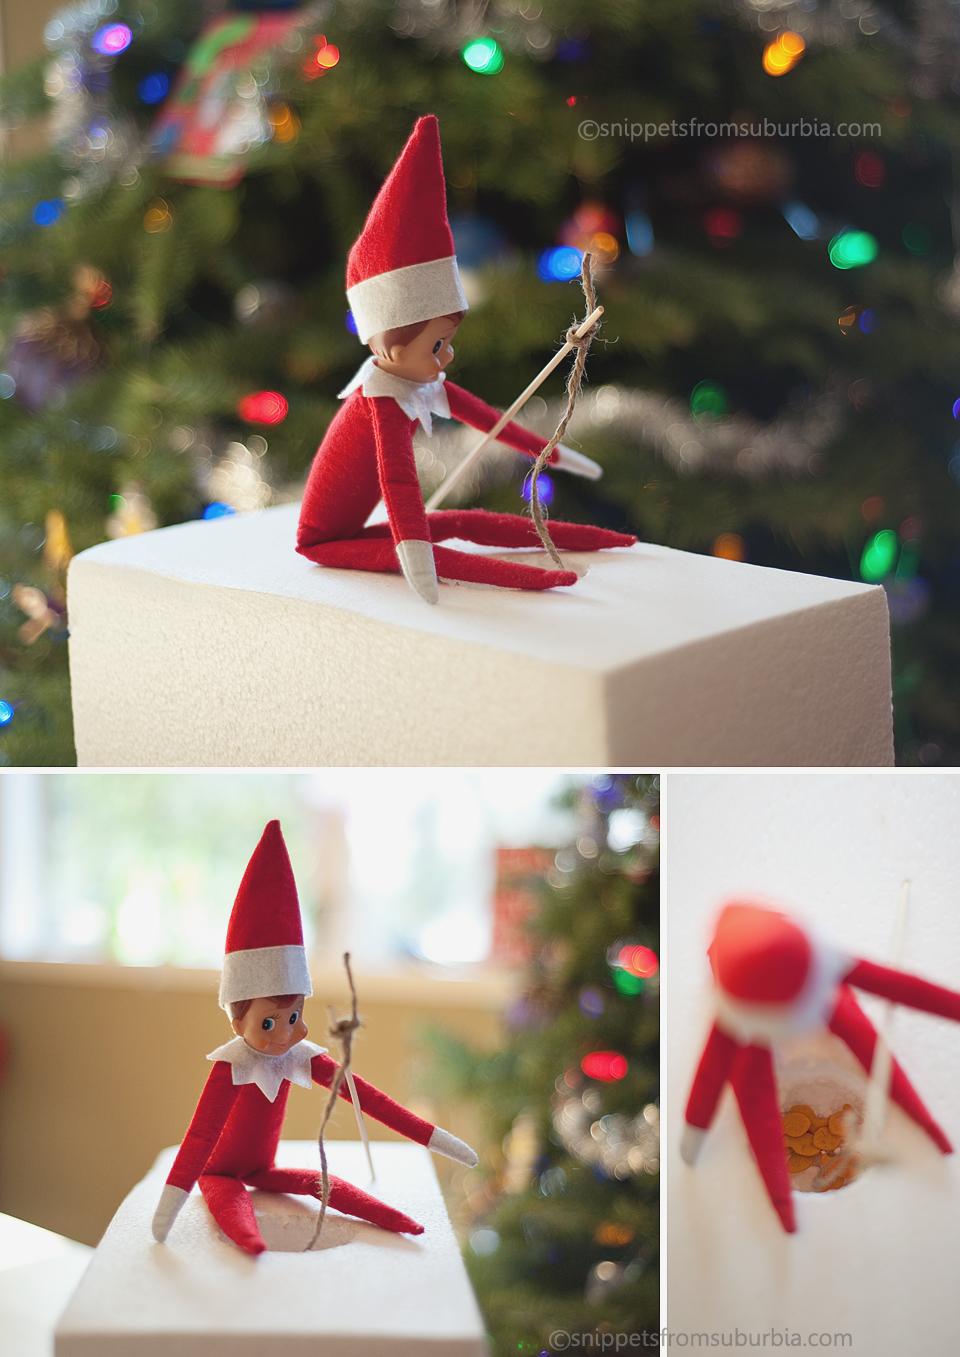 Elf on the Shelf, December 23rd